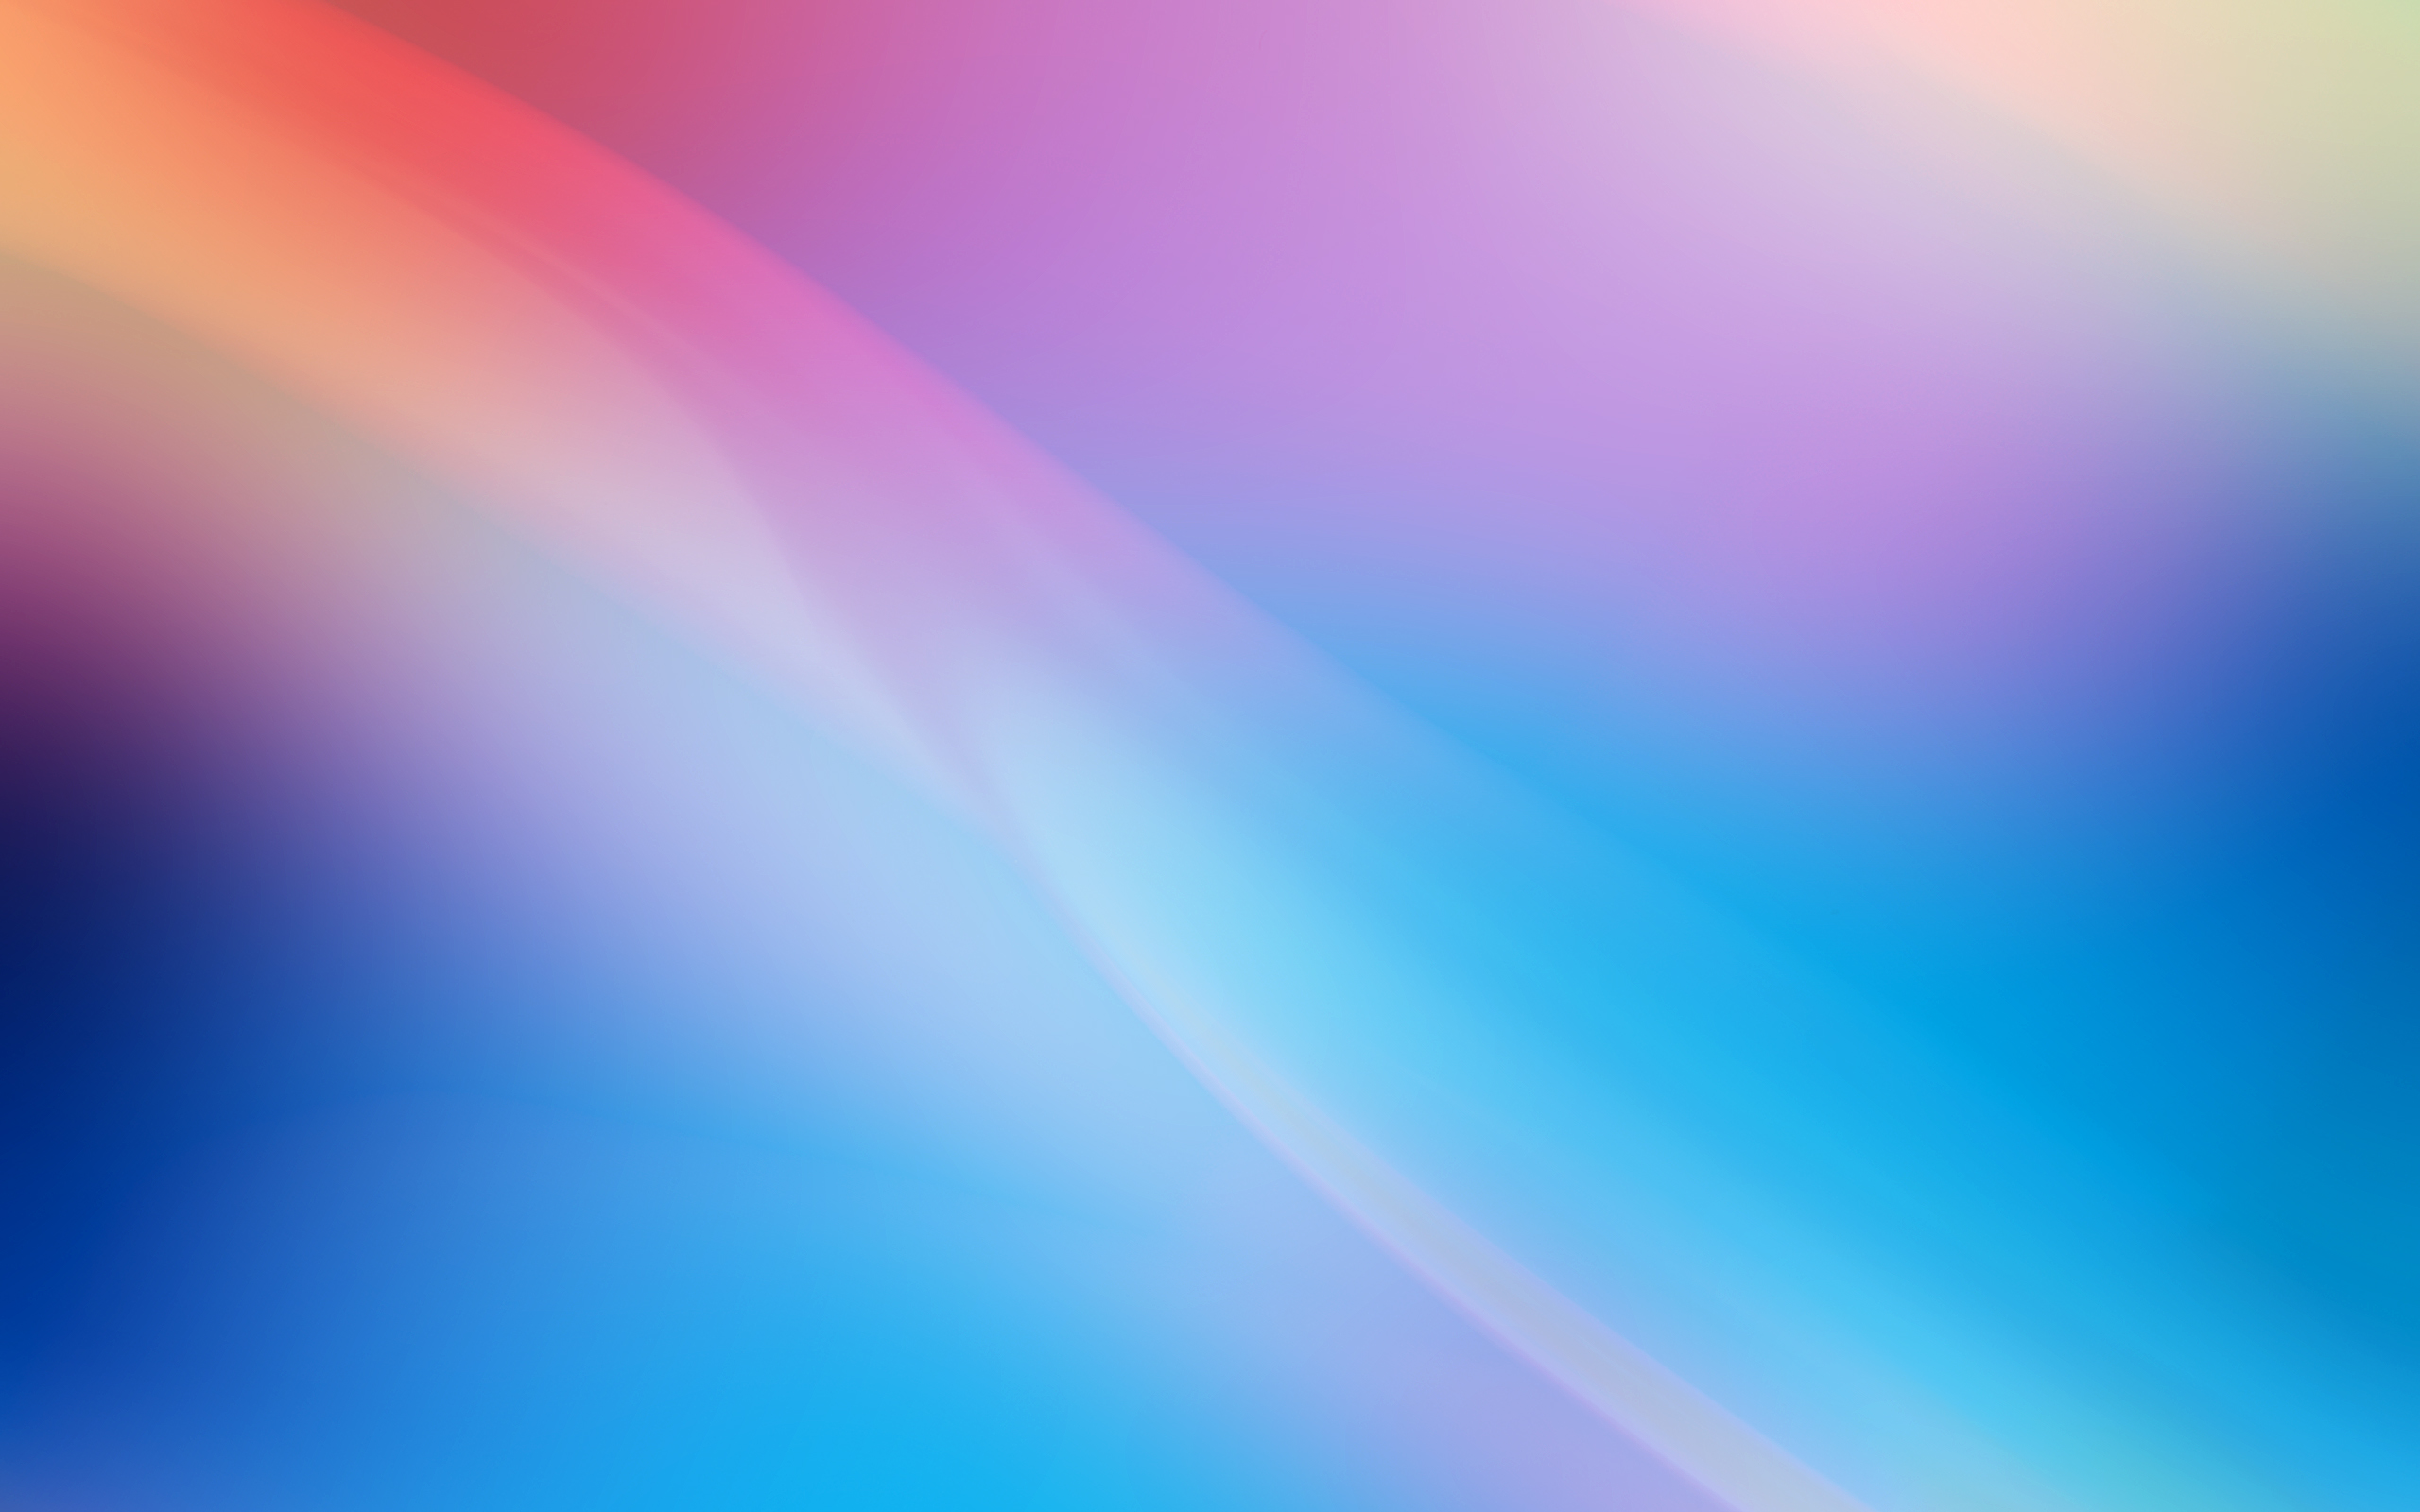 Blue Purple Light and Colors Wallpaper Zon Saja 2560x1600